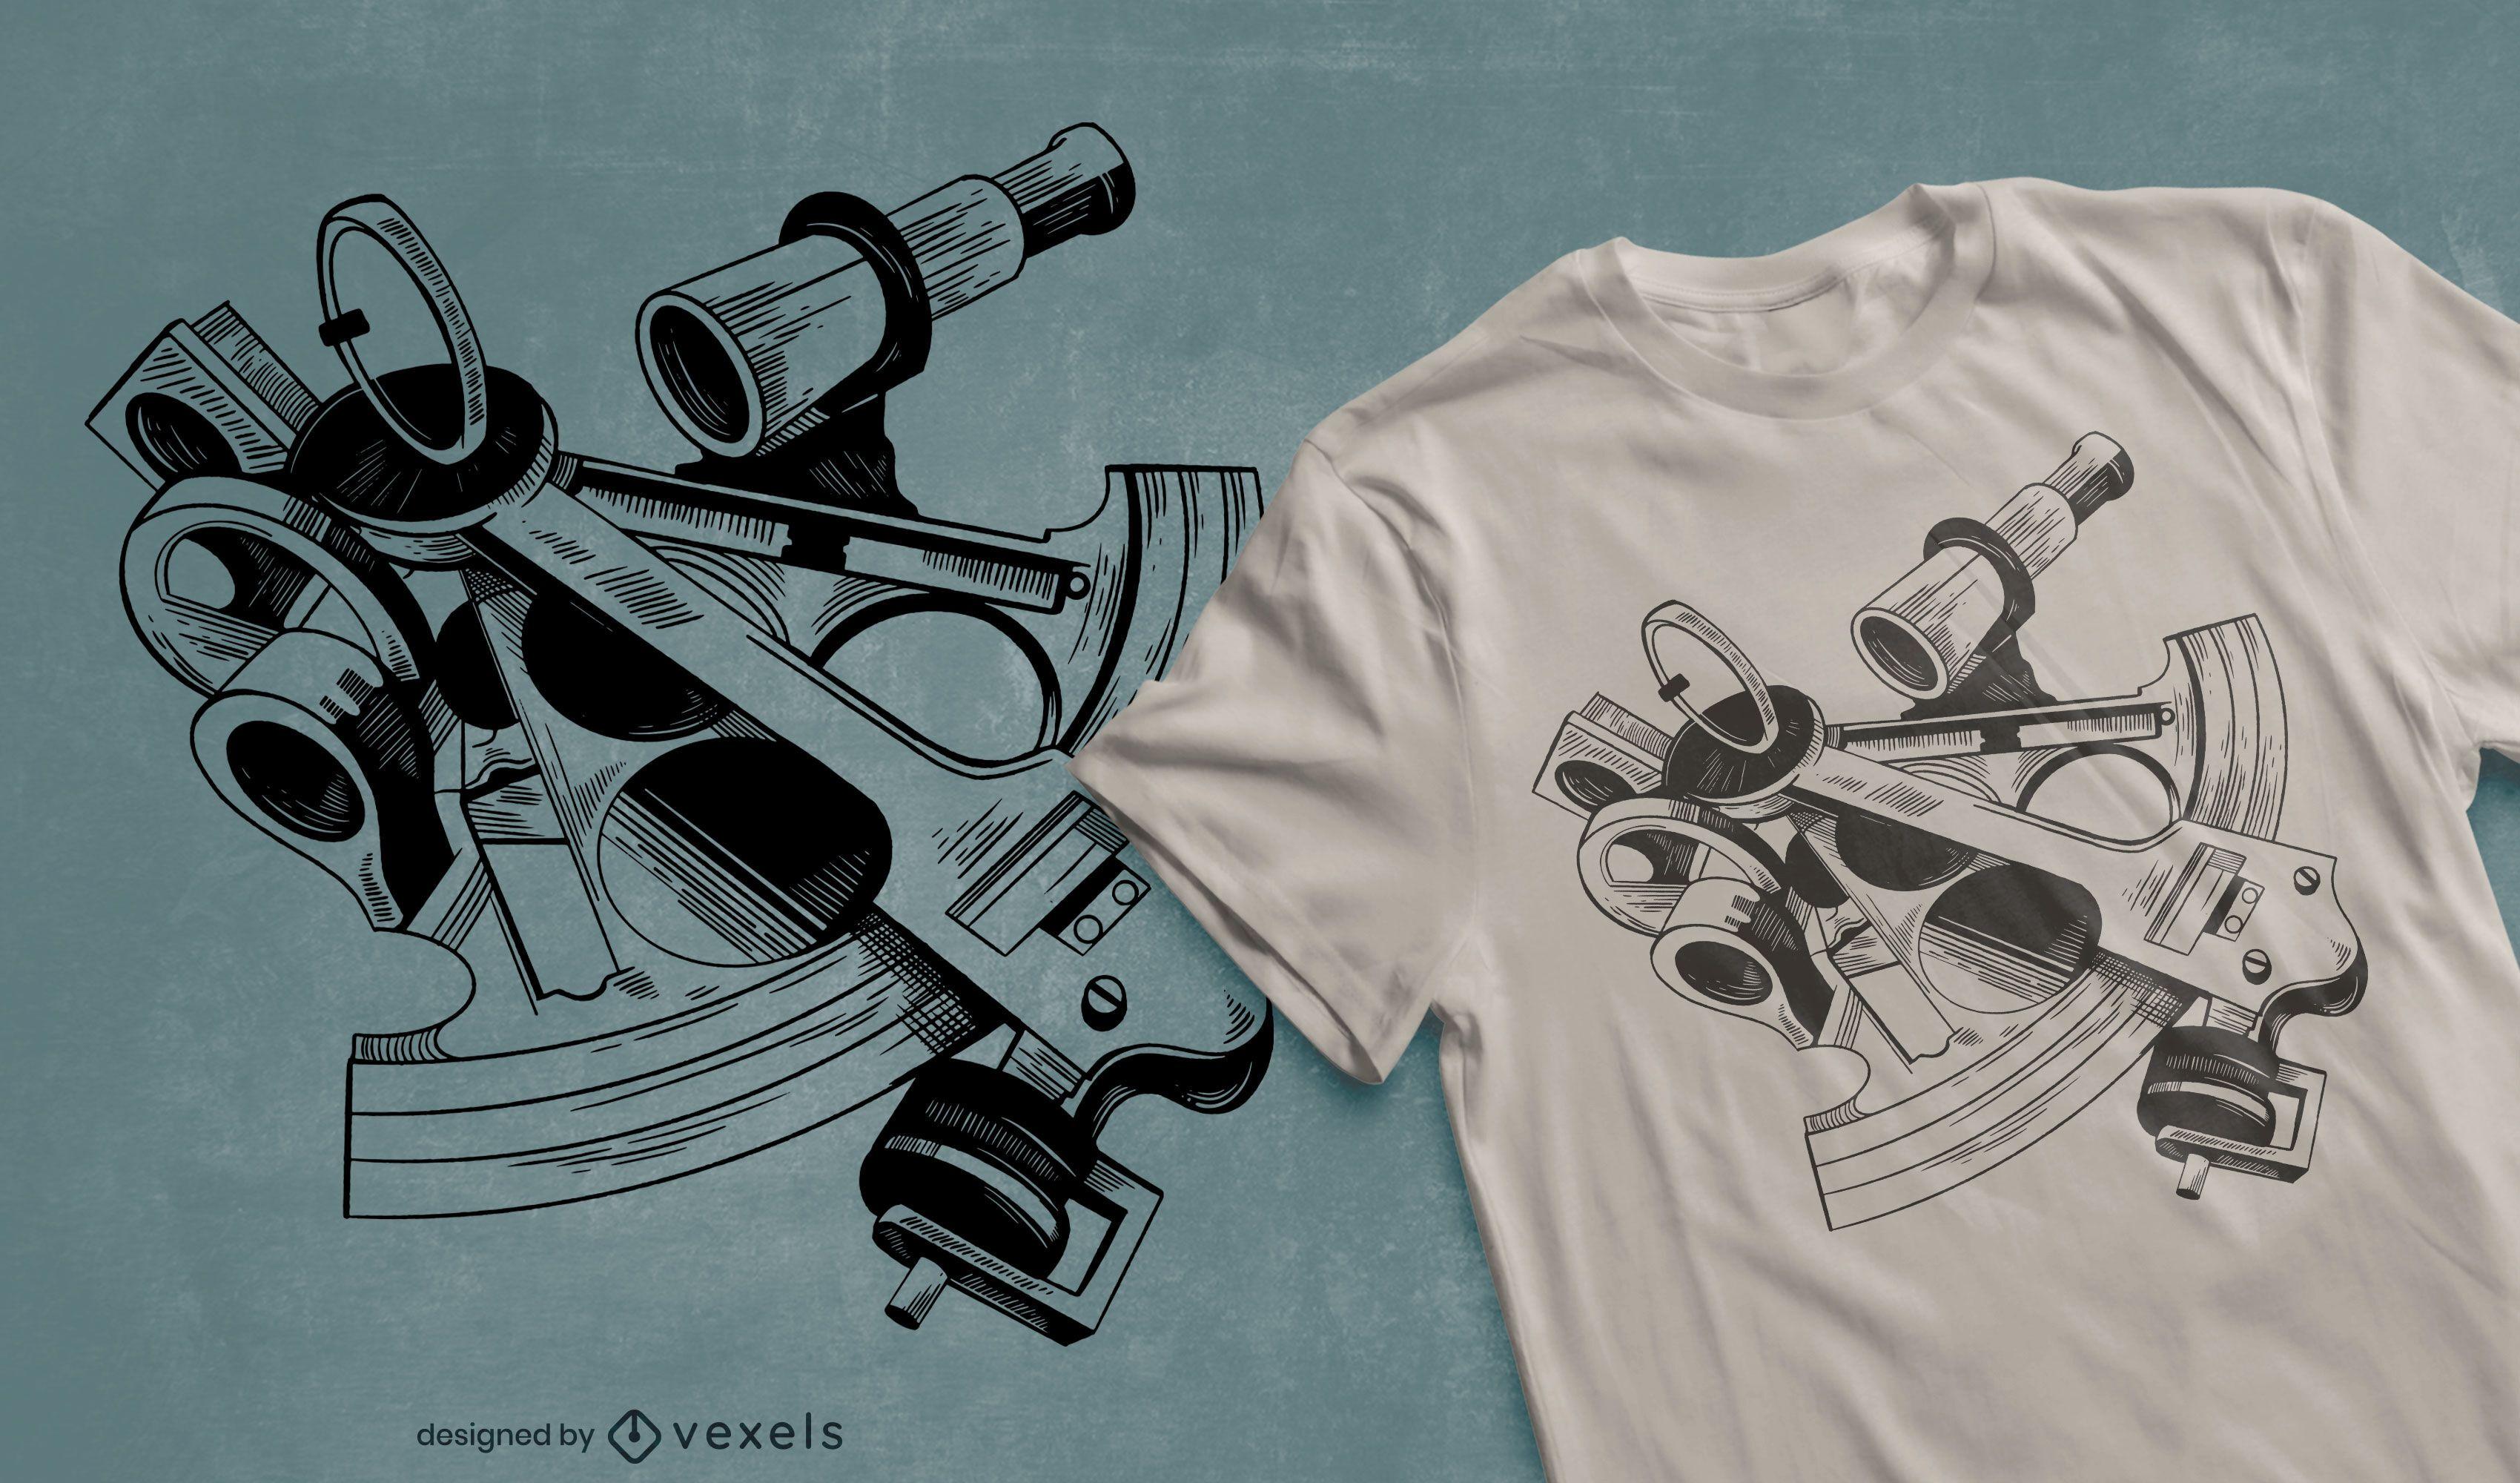 Sextant t-shirt design